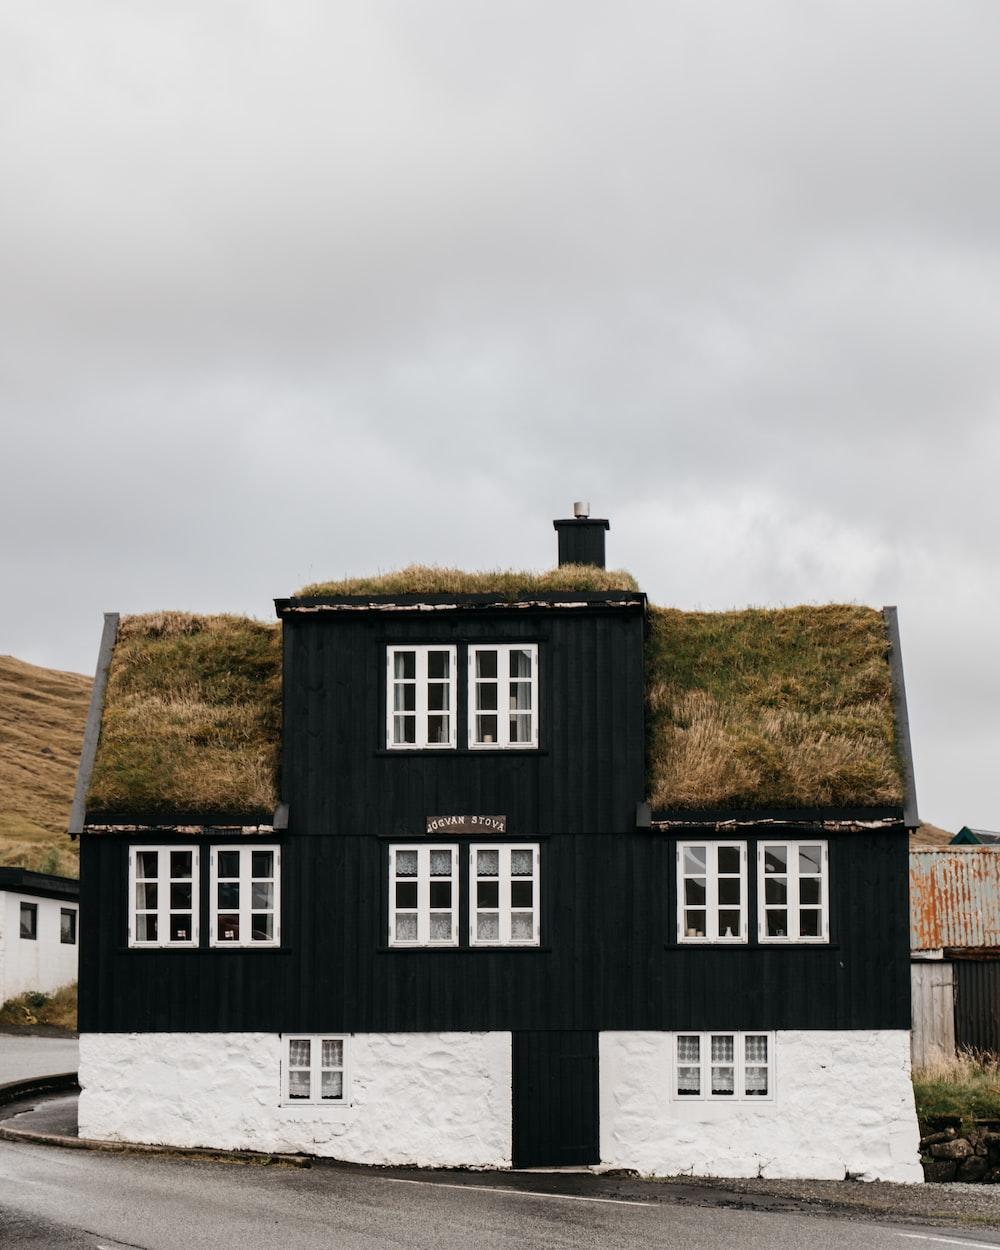 black and white house under white sky during daytime